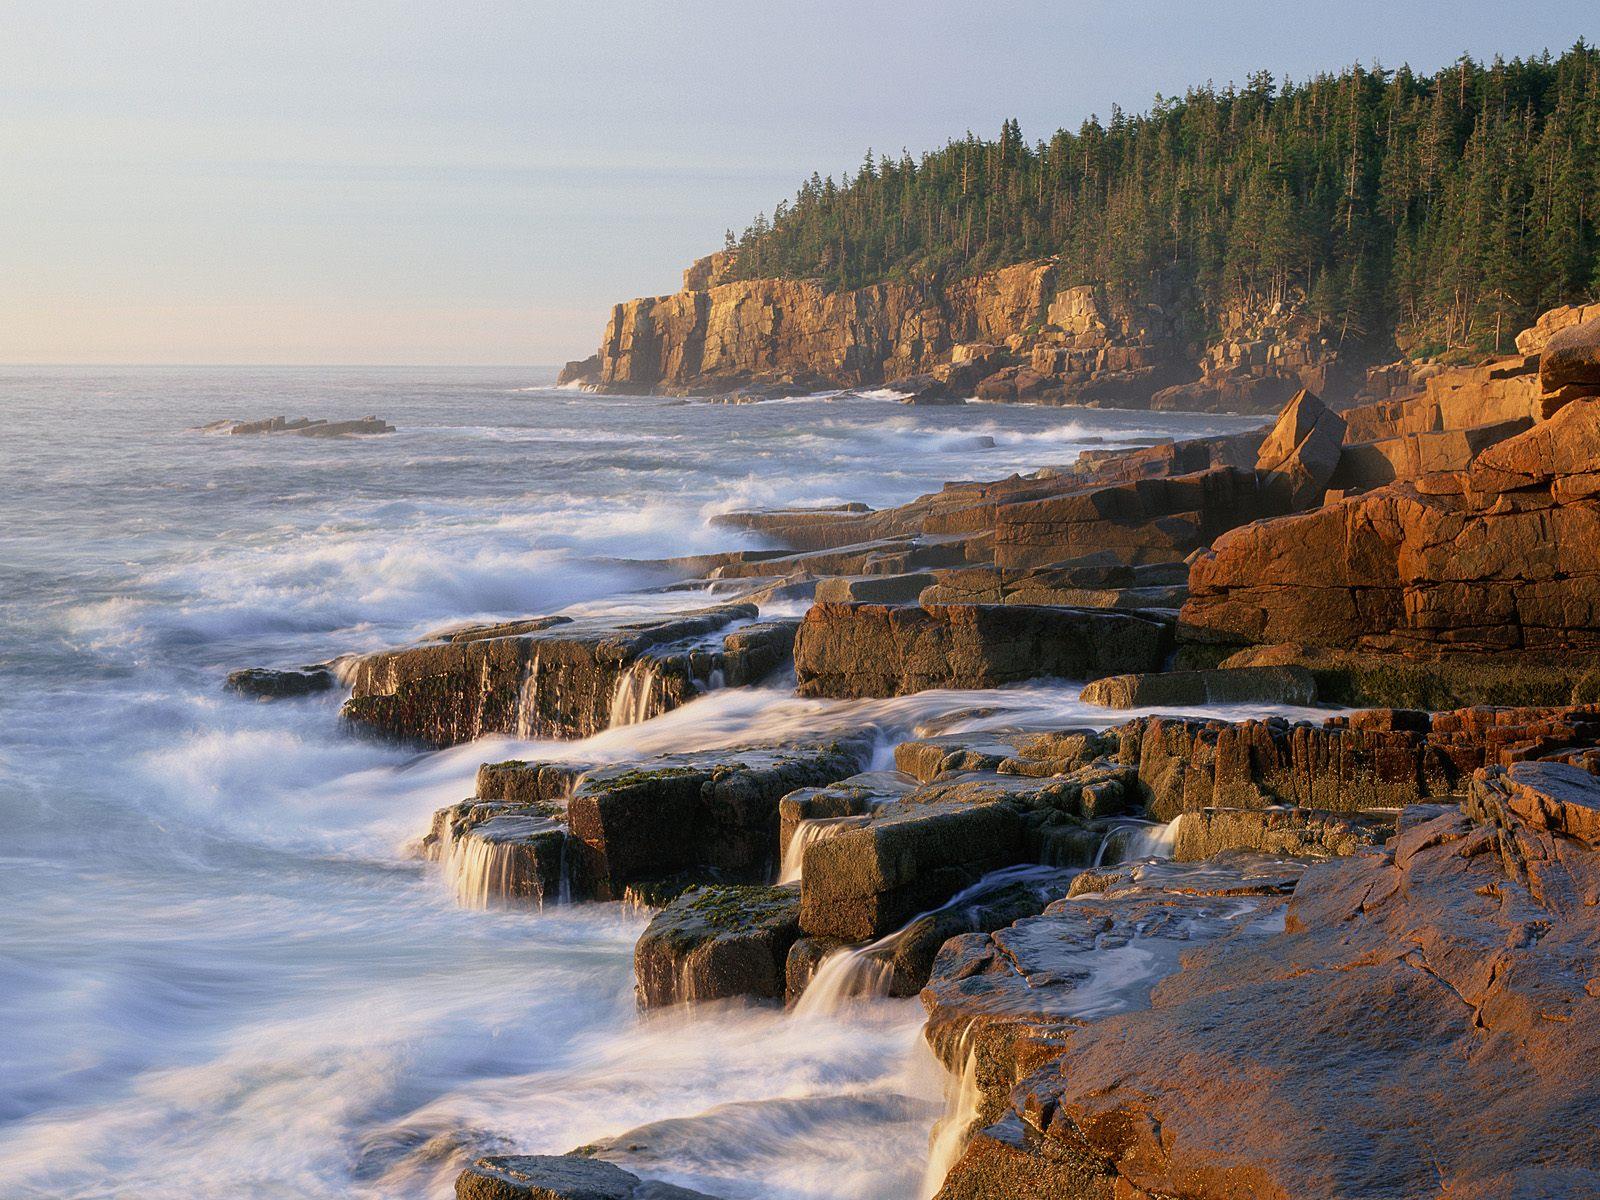 Acadia National Park Image